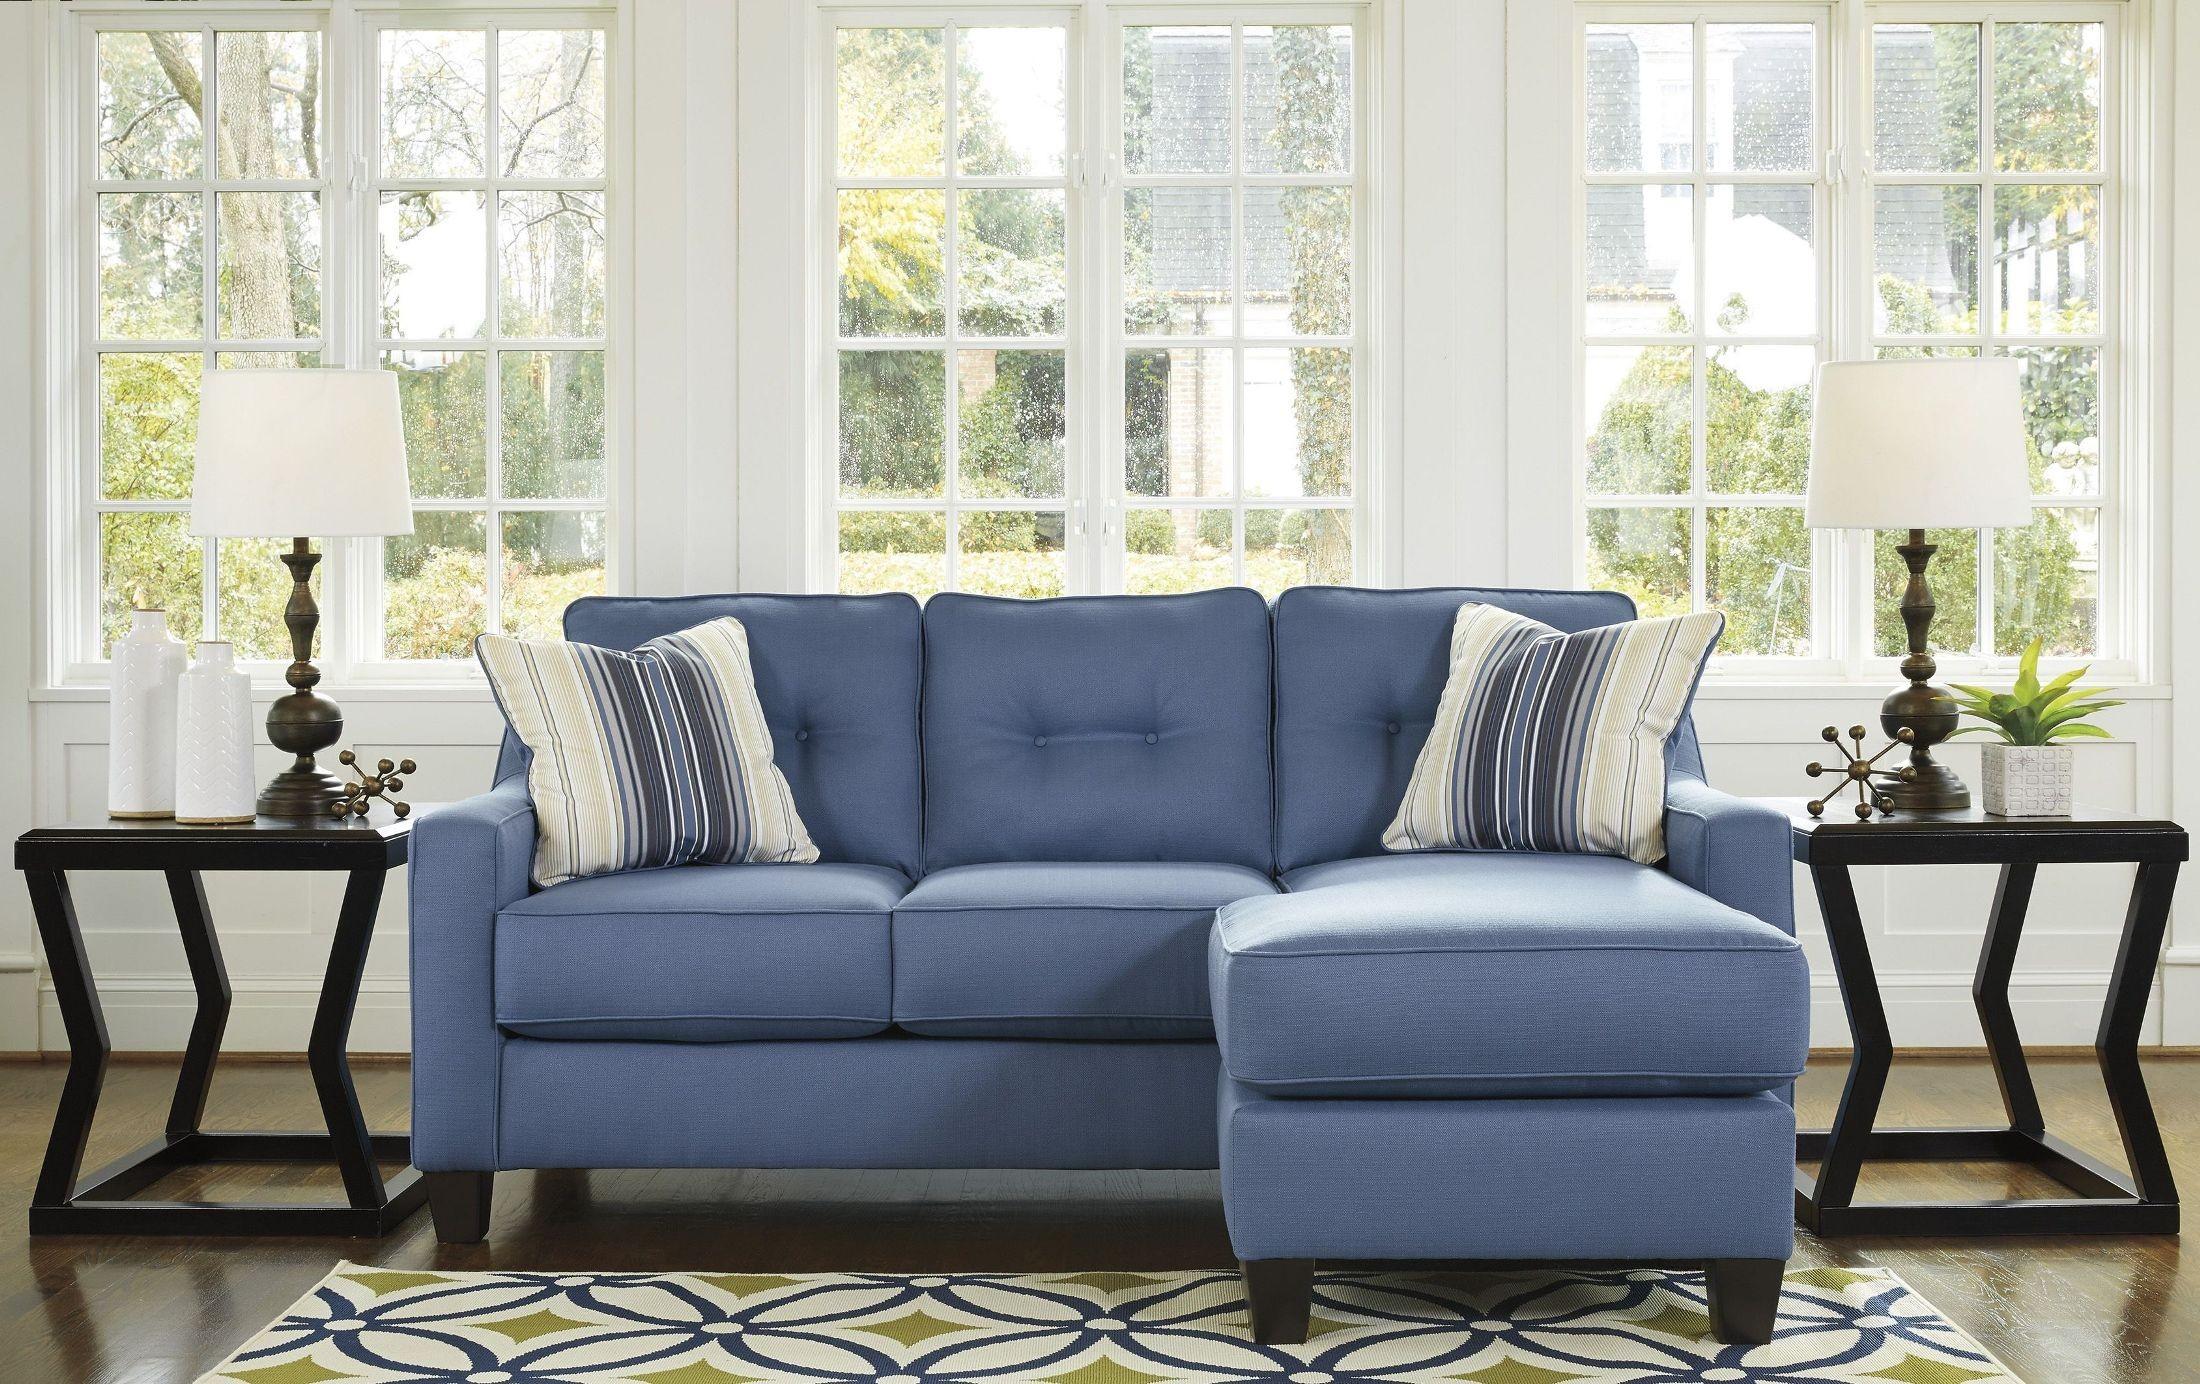 Aldie Nuvella Blue Living Room Set, 6870318, Ashley